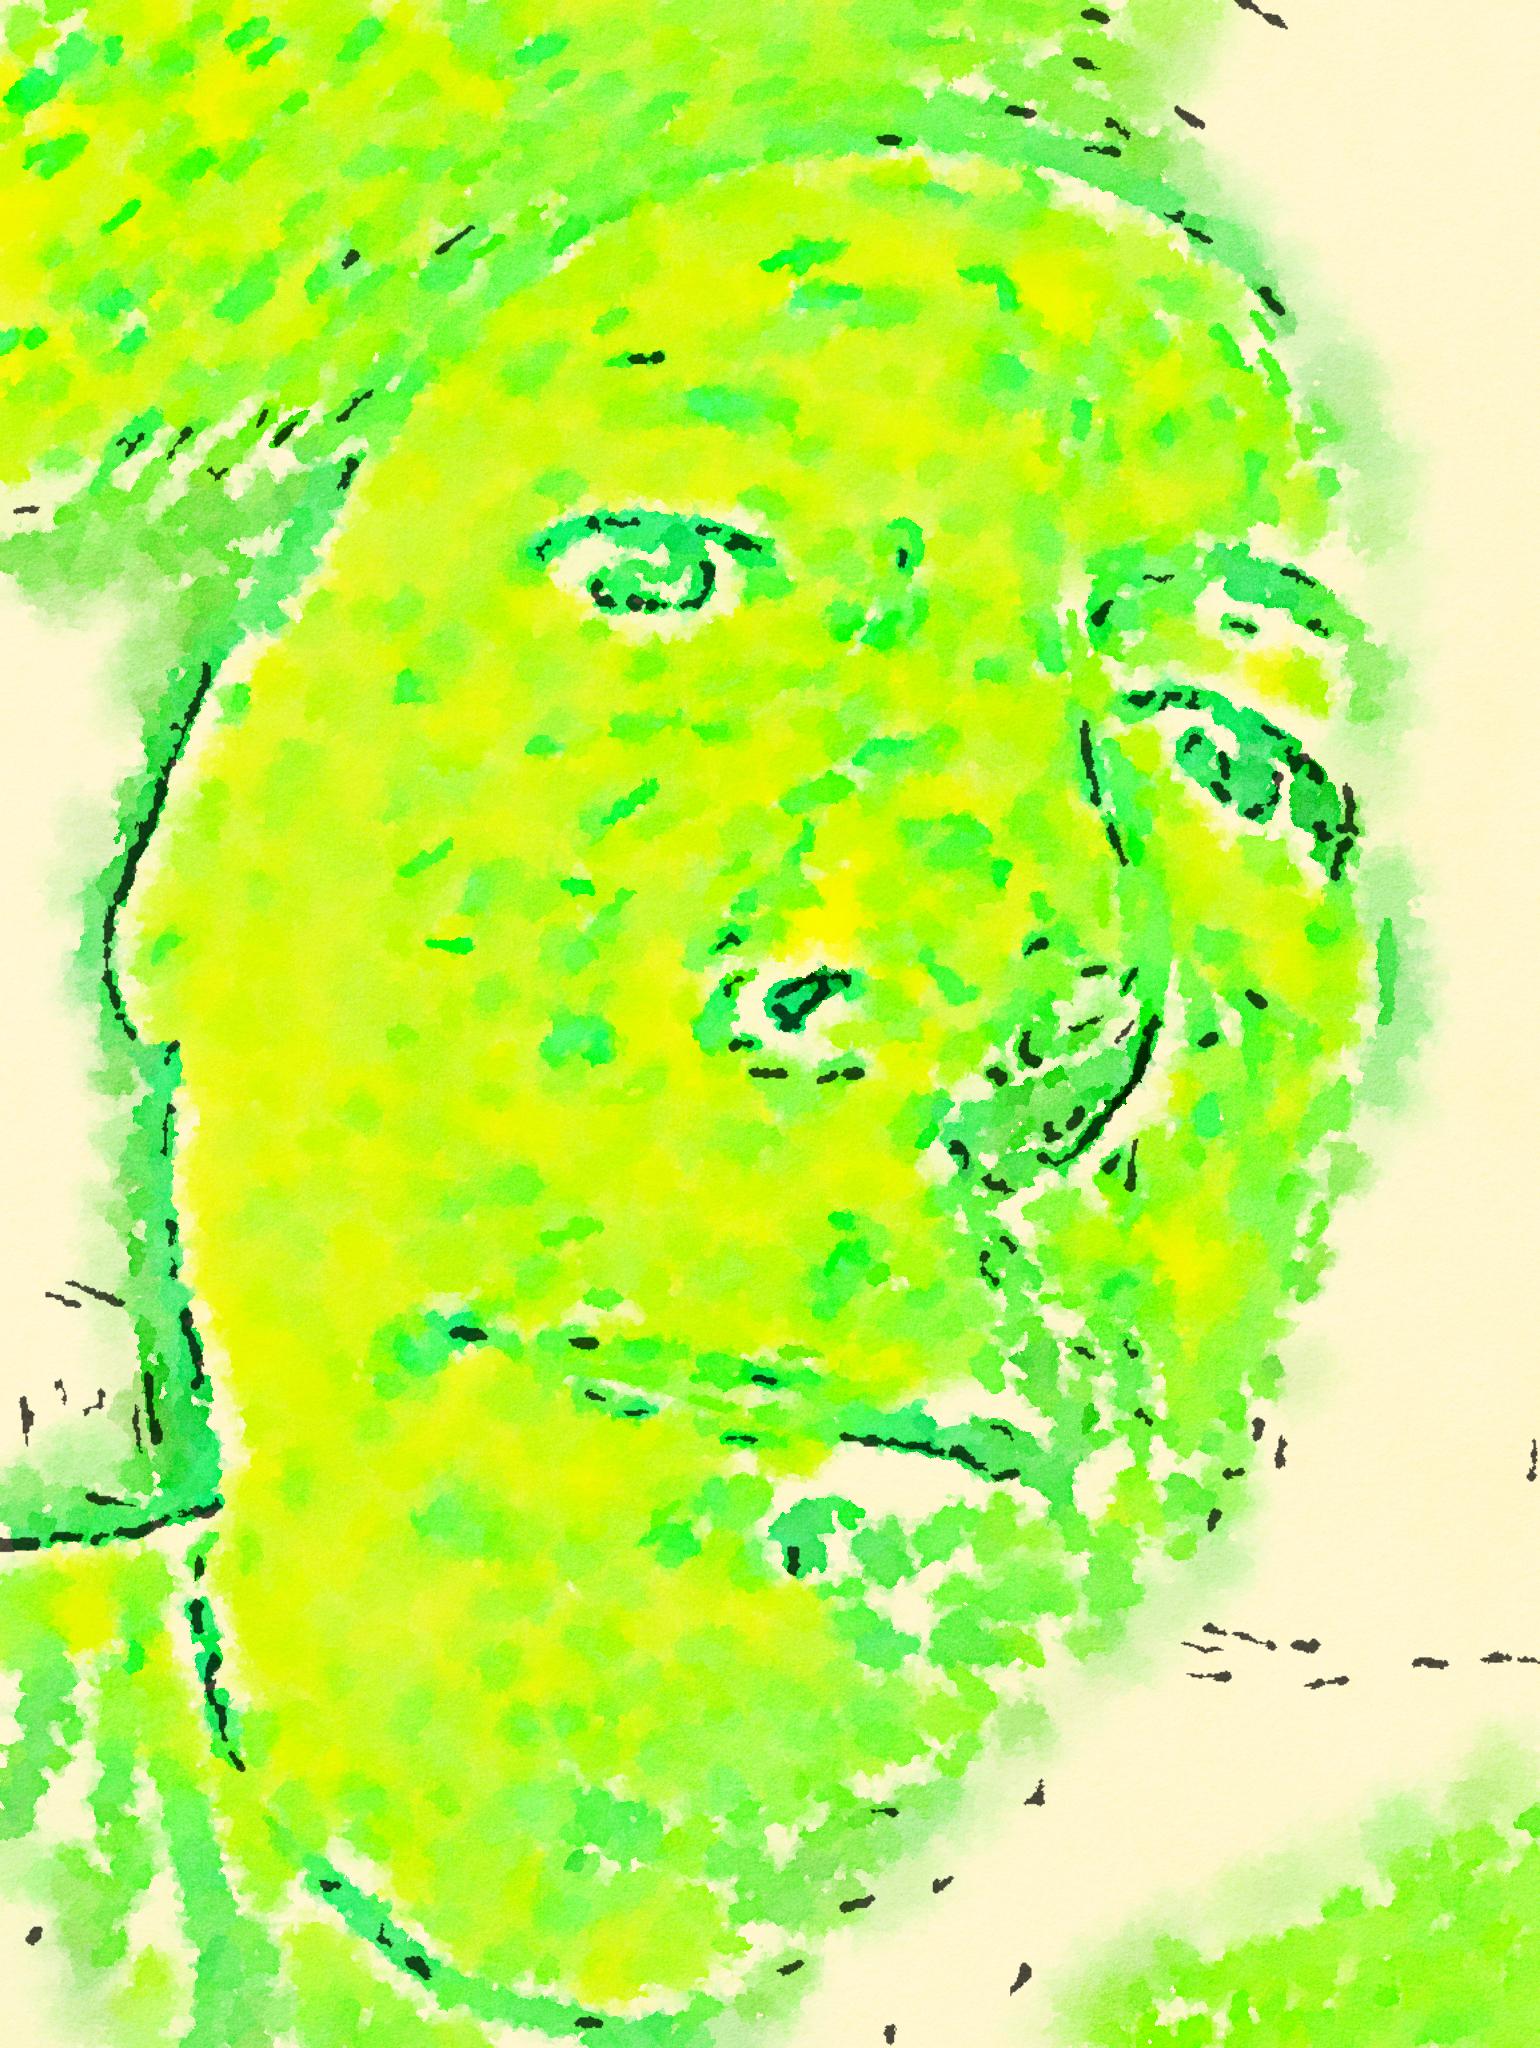 Acid Green Selfie (2019) digitally manipulated photo